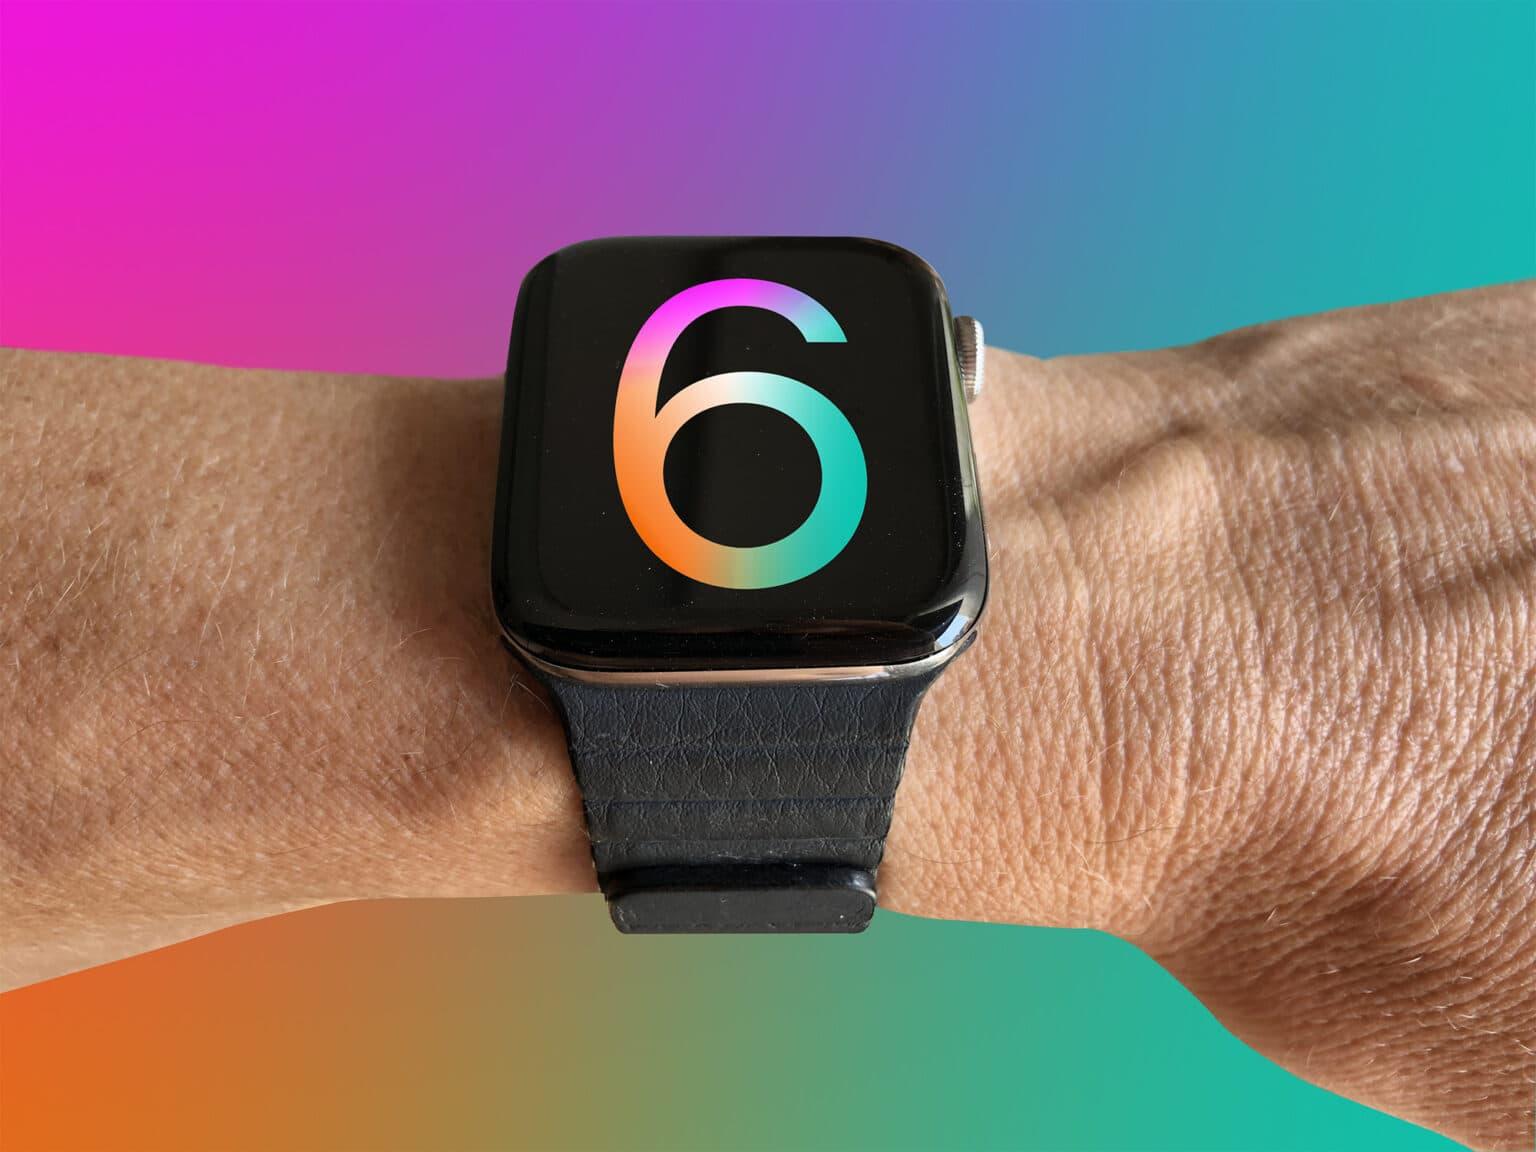 Will Apple Watch Series 6 get a svelte new look?